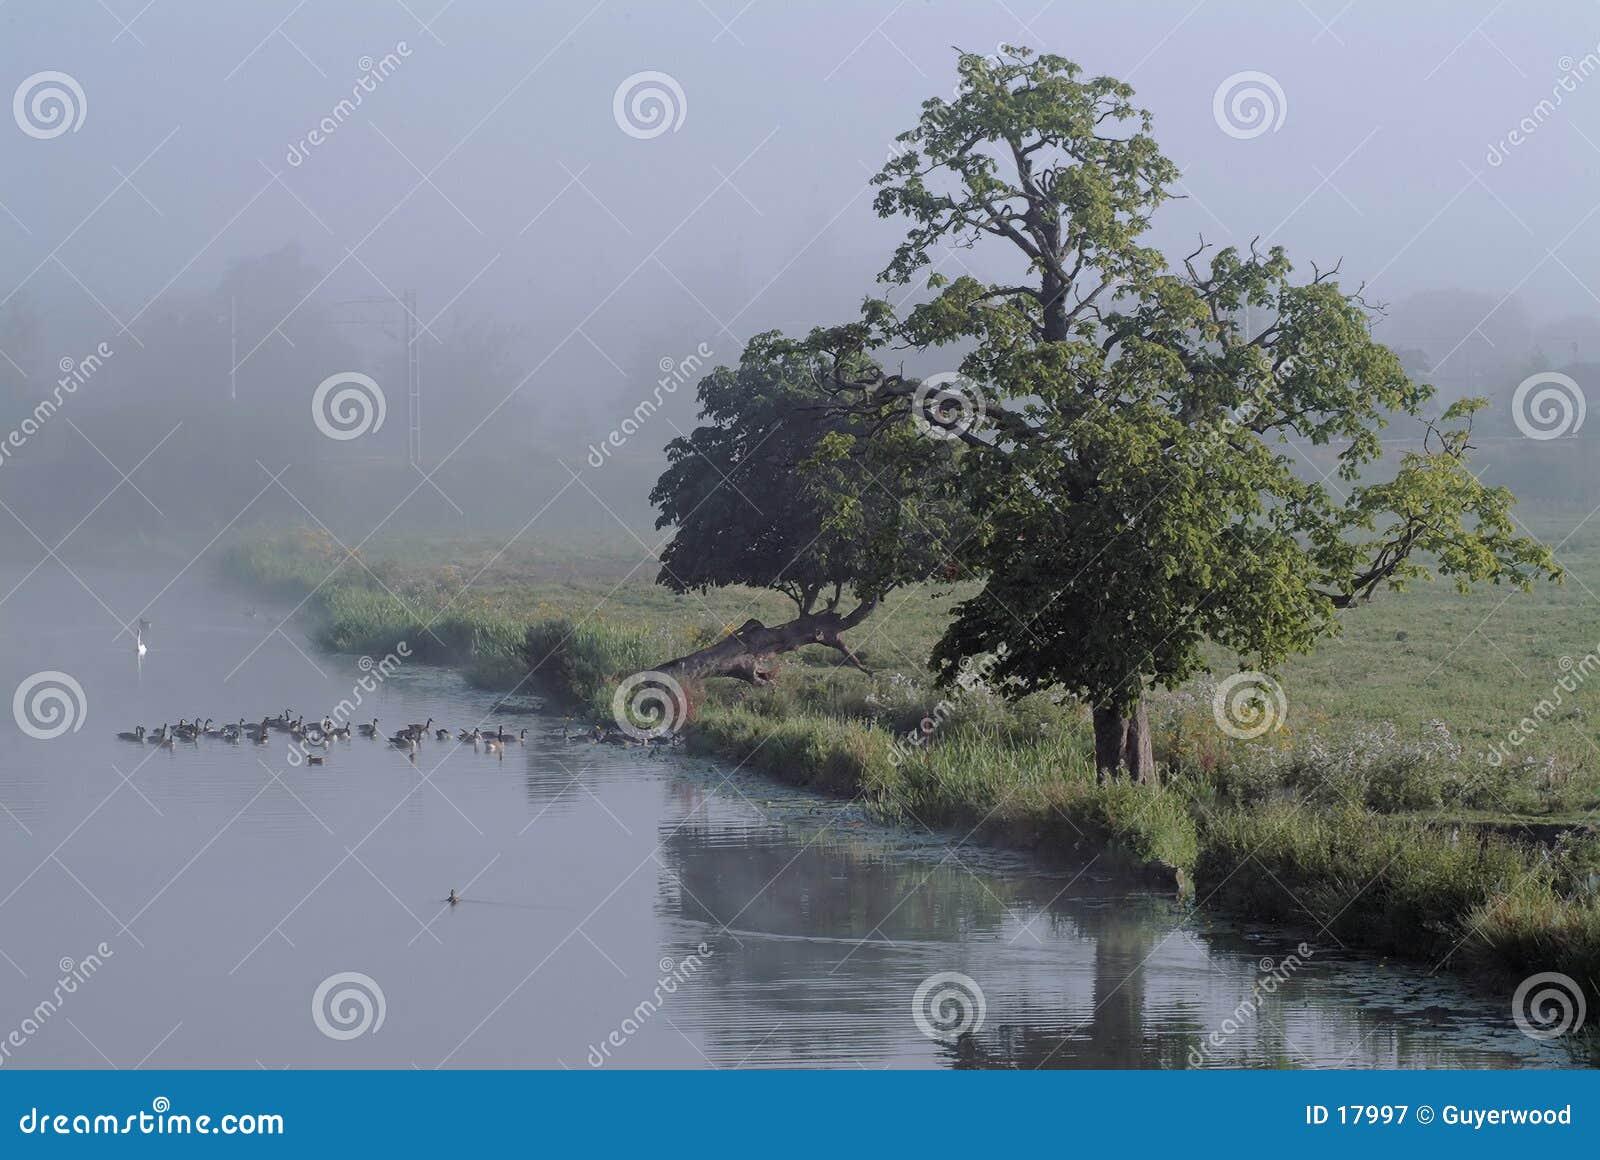 Misty riverside morning